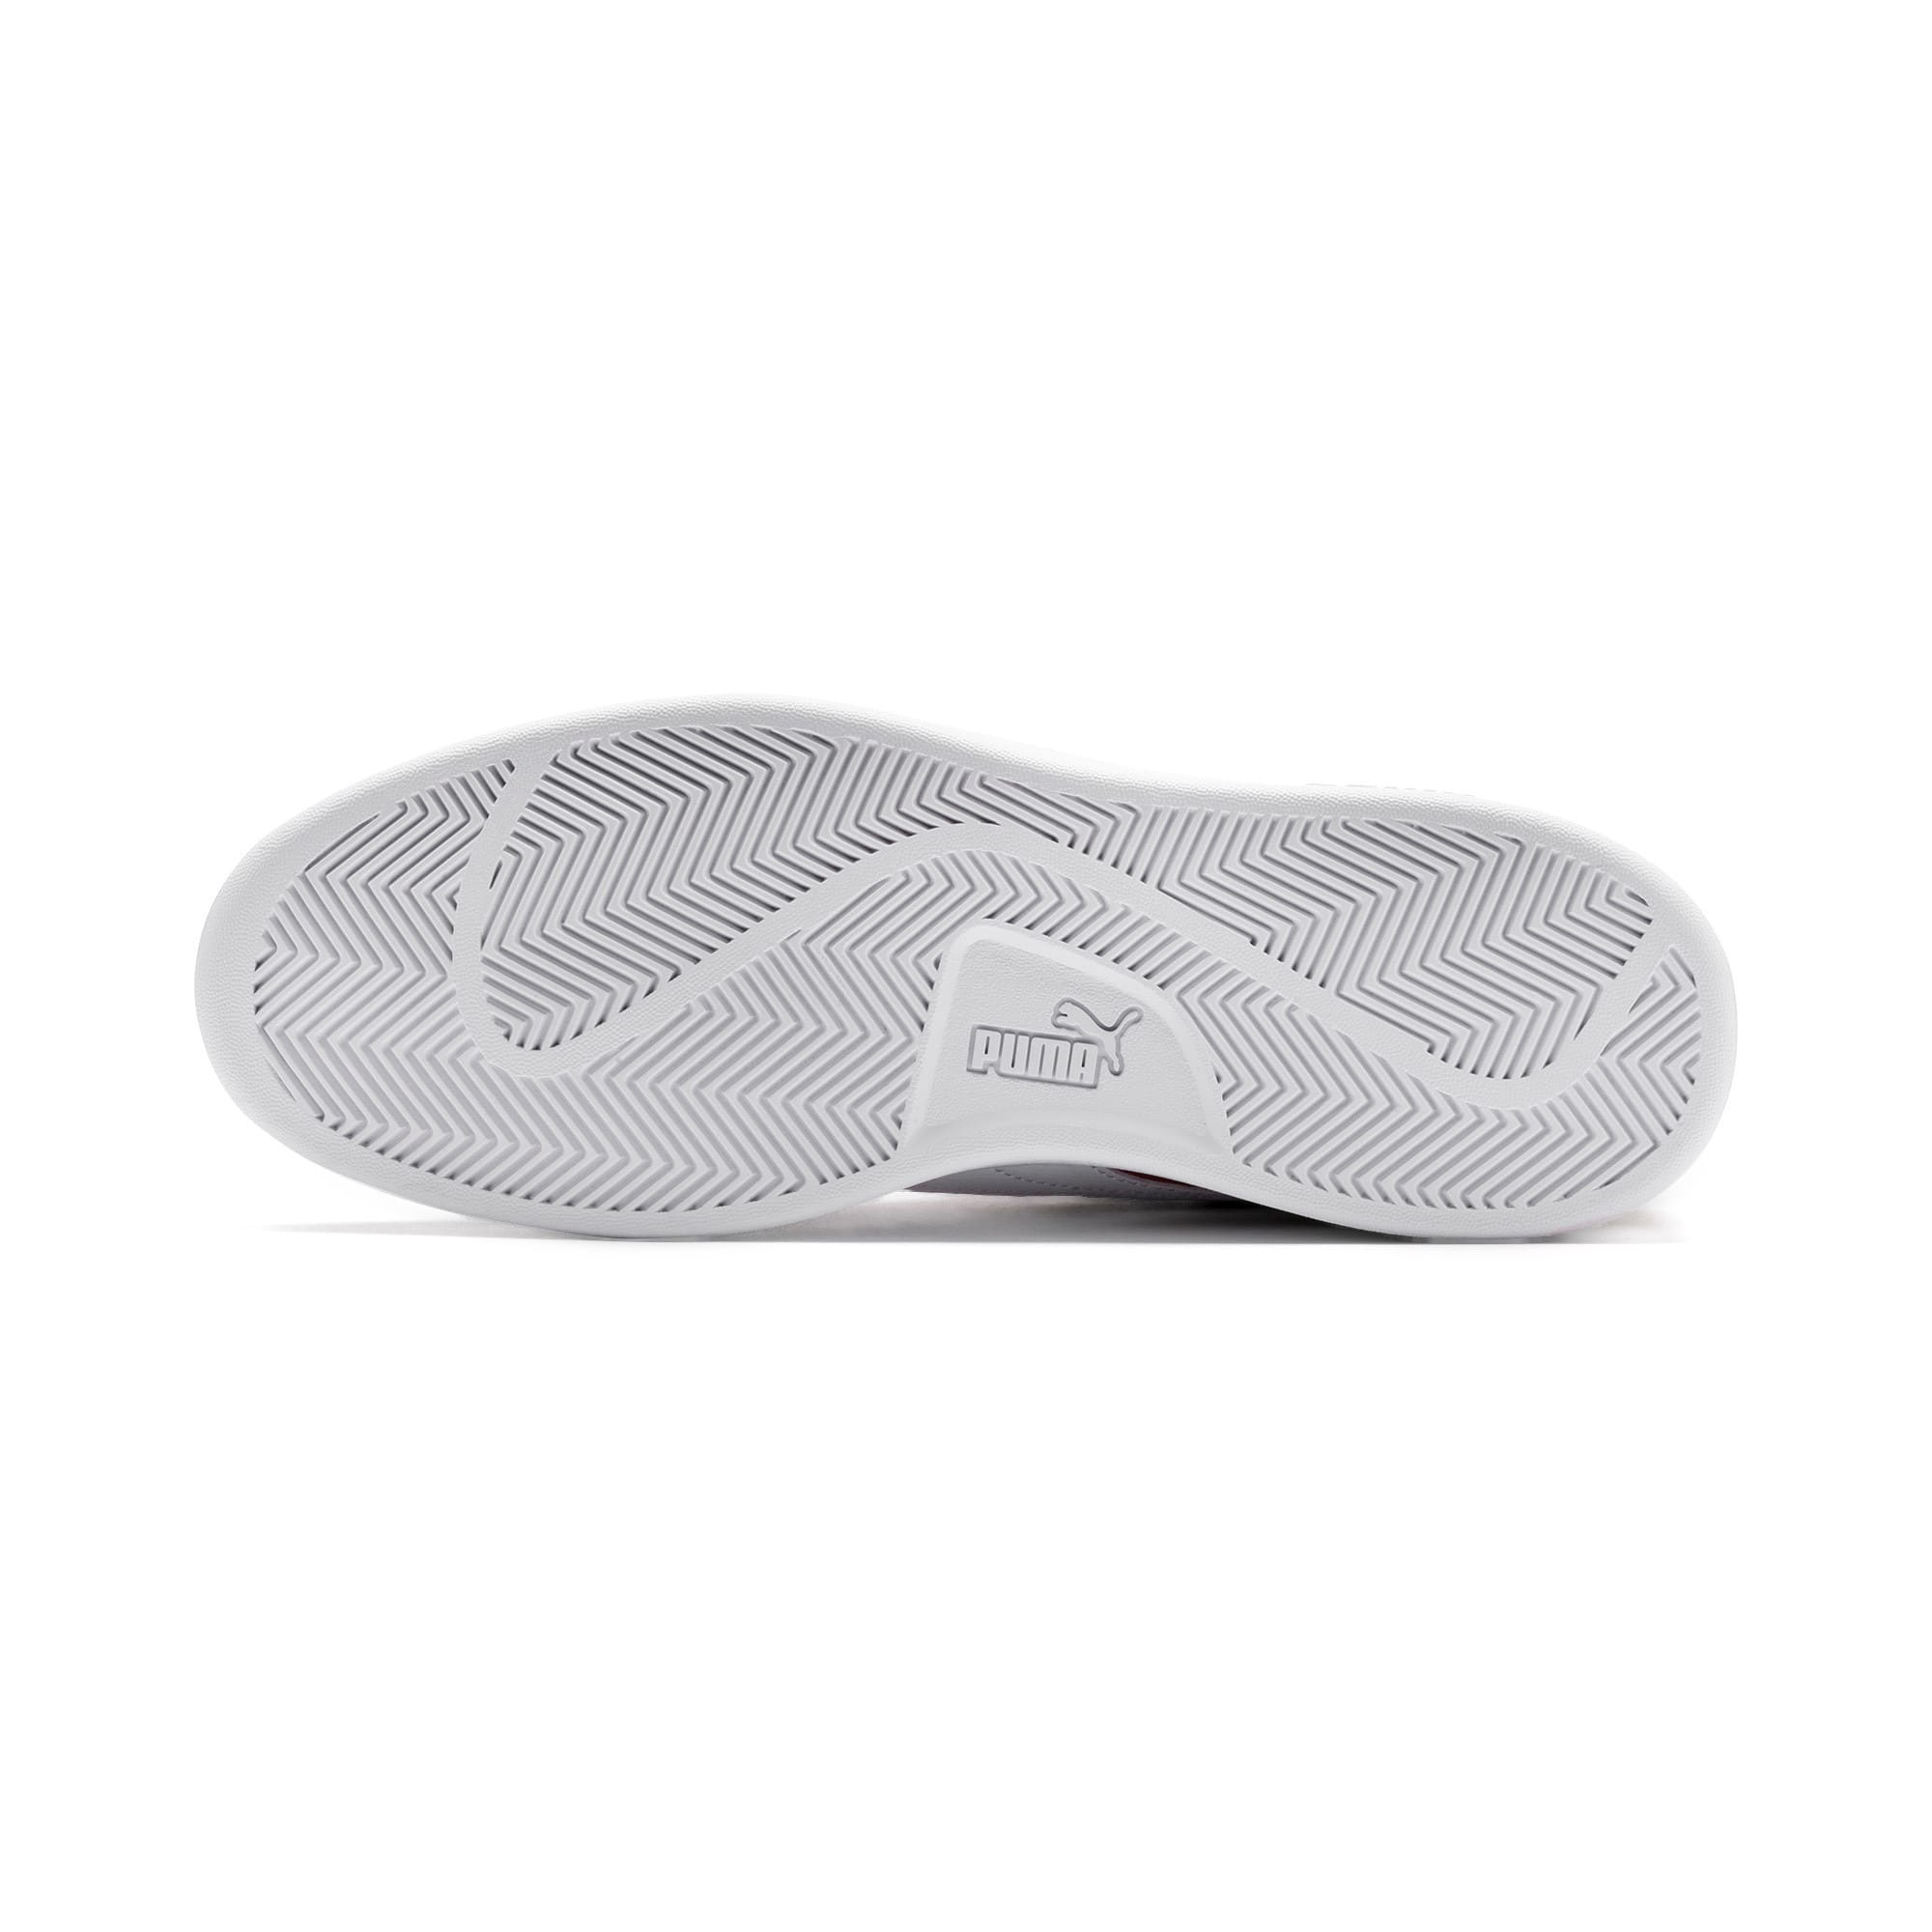 Miniatura 5 de Zapatos deportivos Astro Kick, Rhubarb-Puma White-Gold, mediano